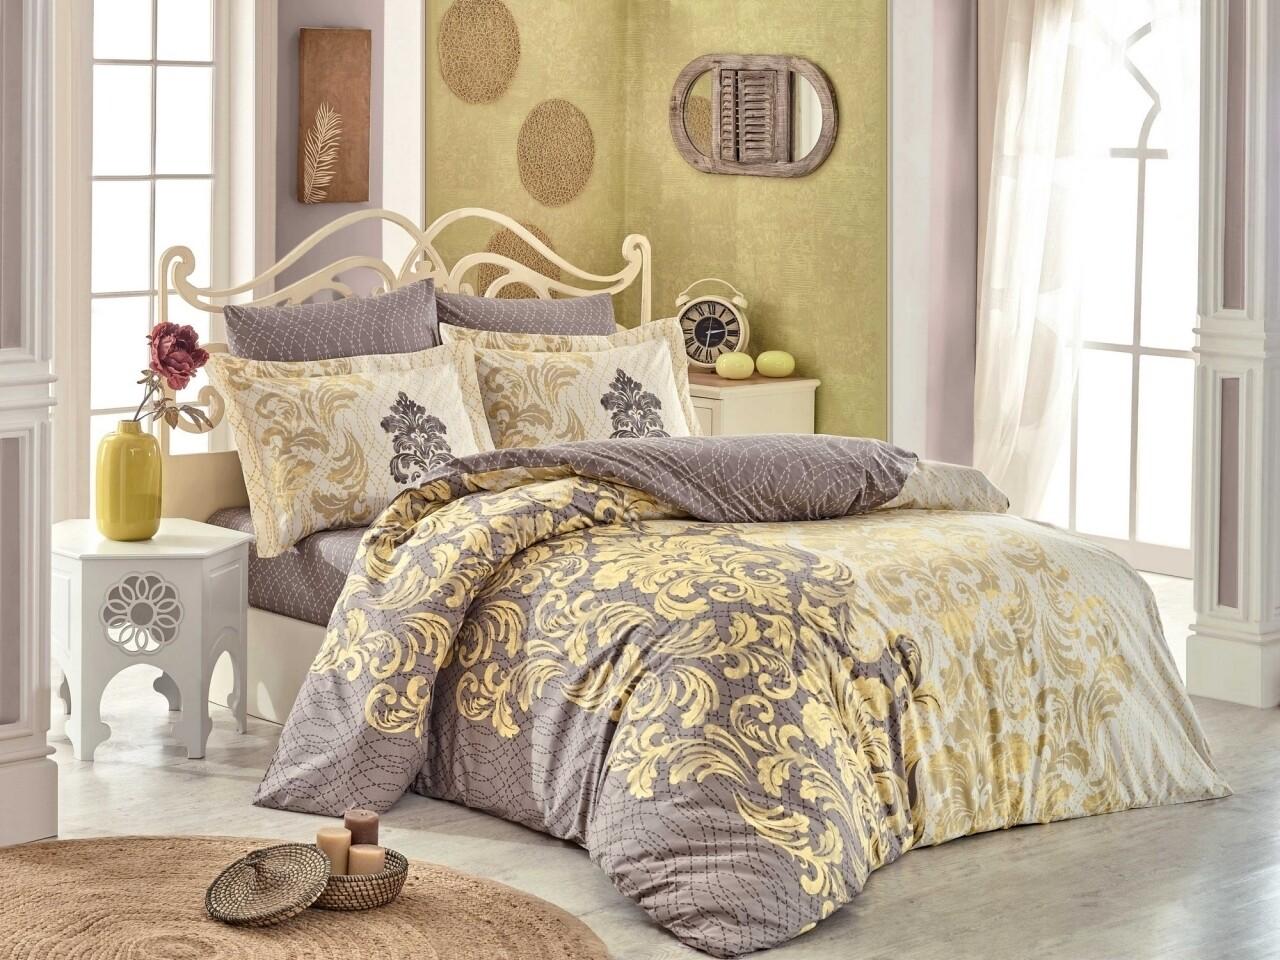 Lenjerie de pat pentru o persoana, 3 piese, 100% bumbac poplin, Hobby, Mirella Cappuccino, bej/auriu